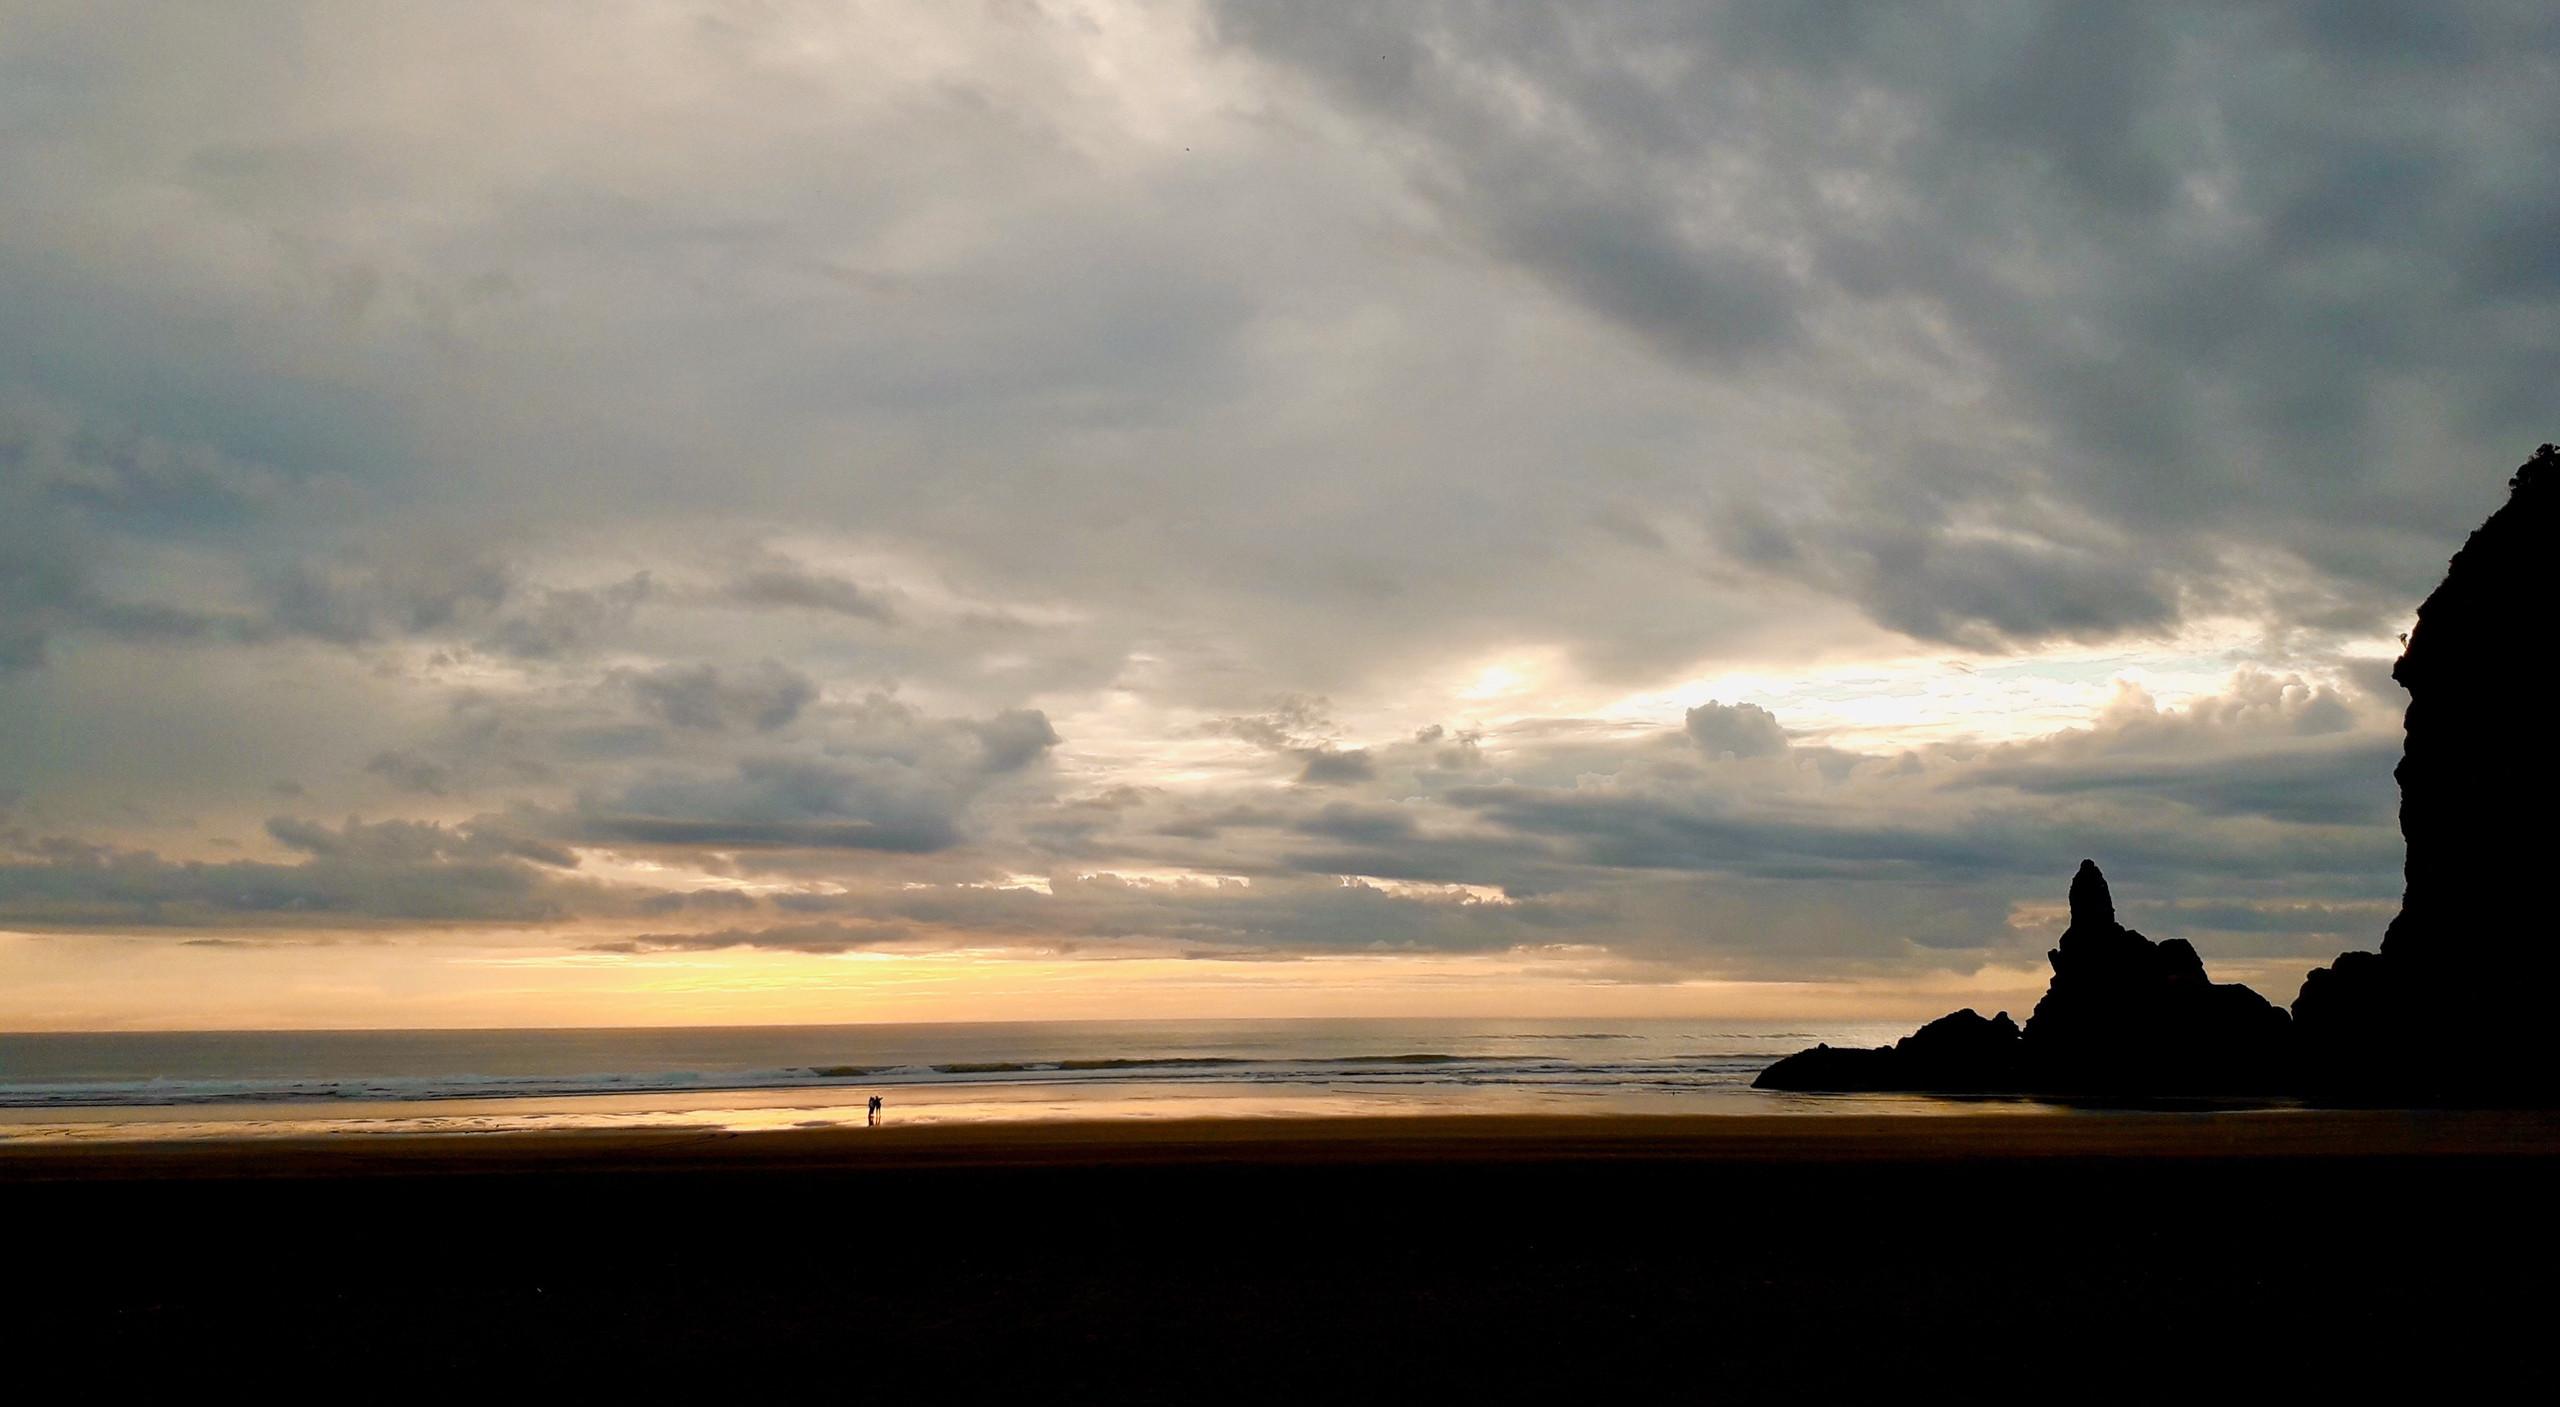 Rainy Sunset on Piha Beach ©Taina CALISSI